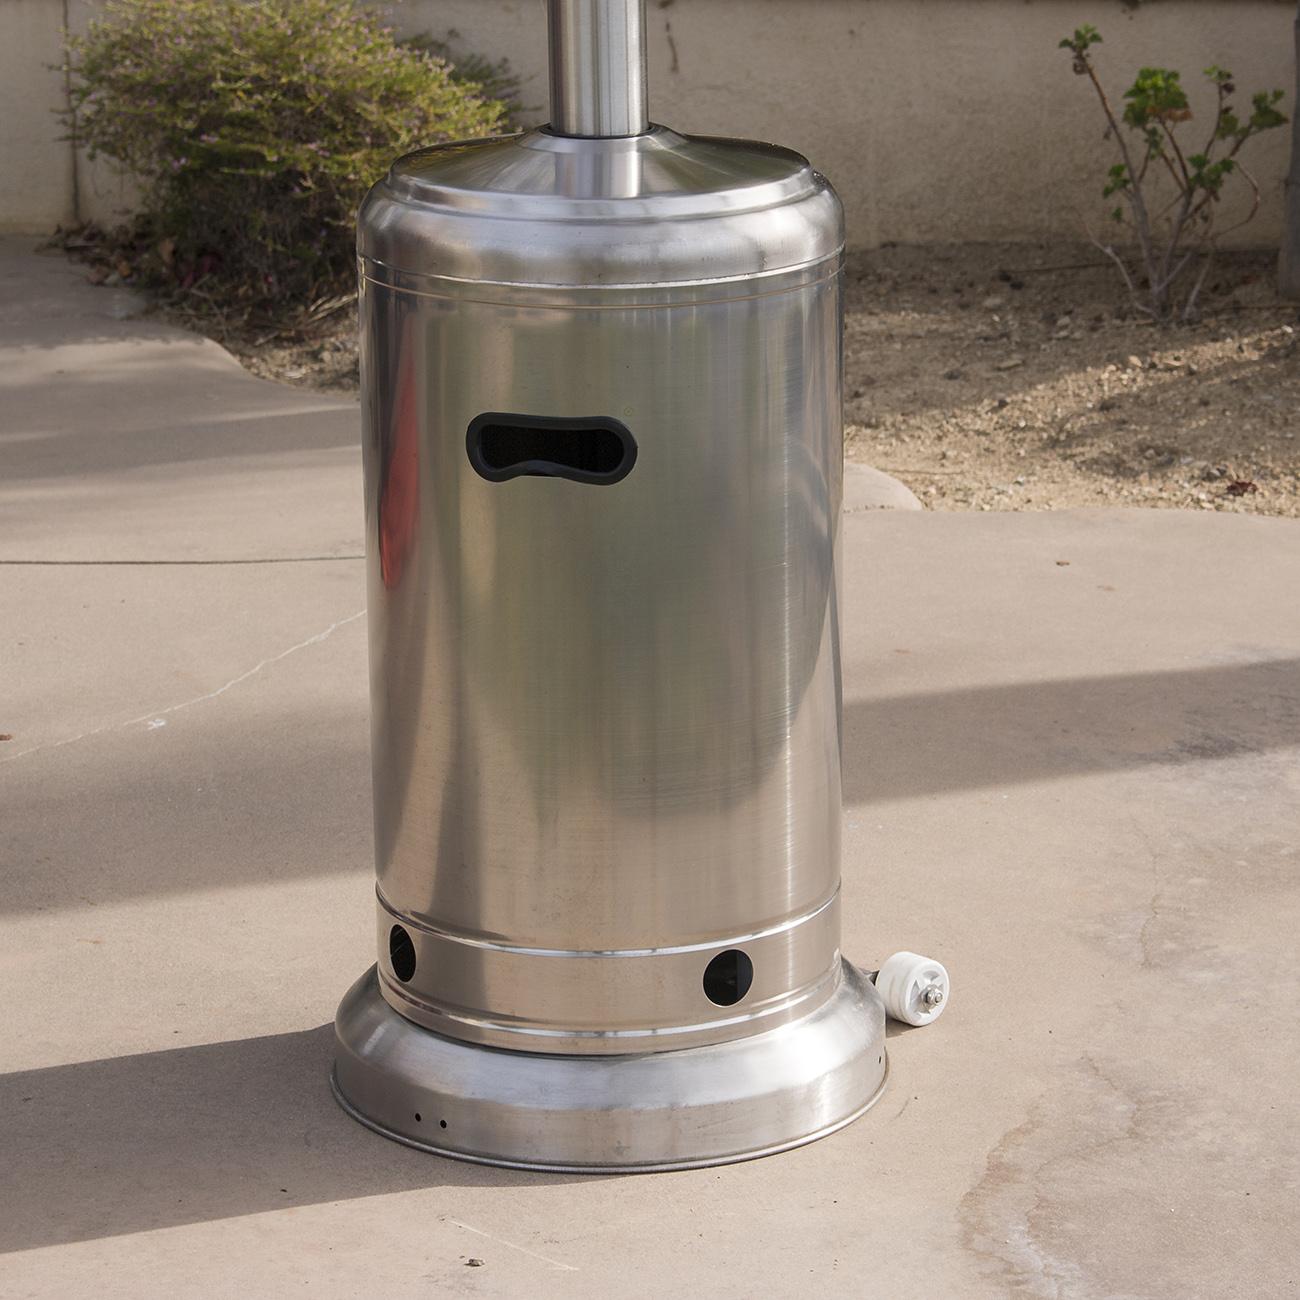 48000 Btu Outdoor Stainless Steel Propane Patio Garden